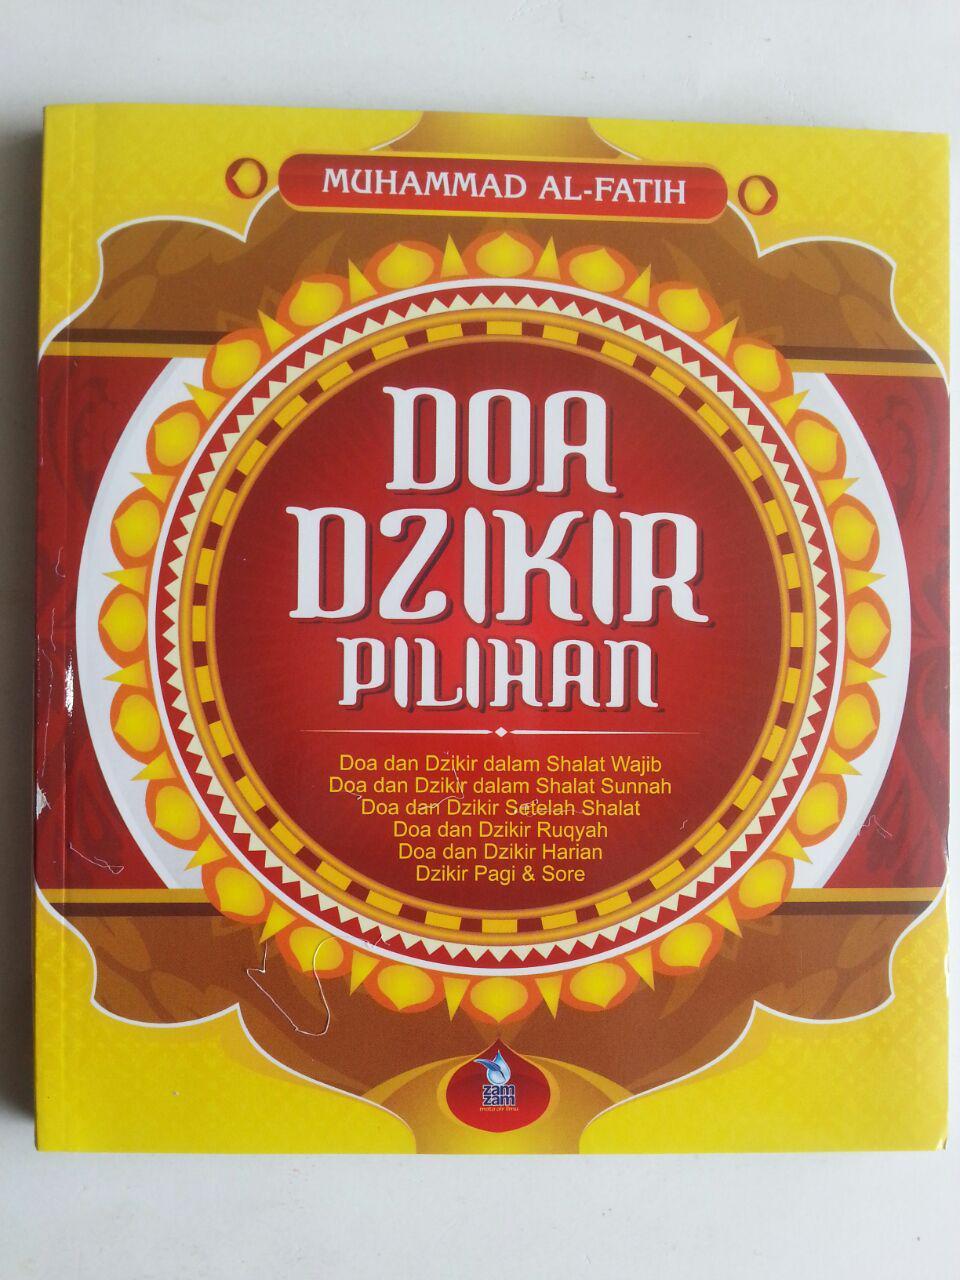 Buku Doa Dzikir Pilihan cover 2